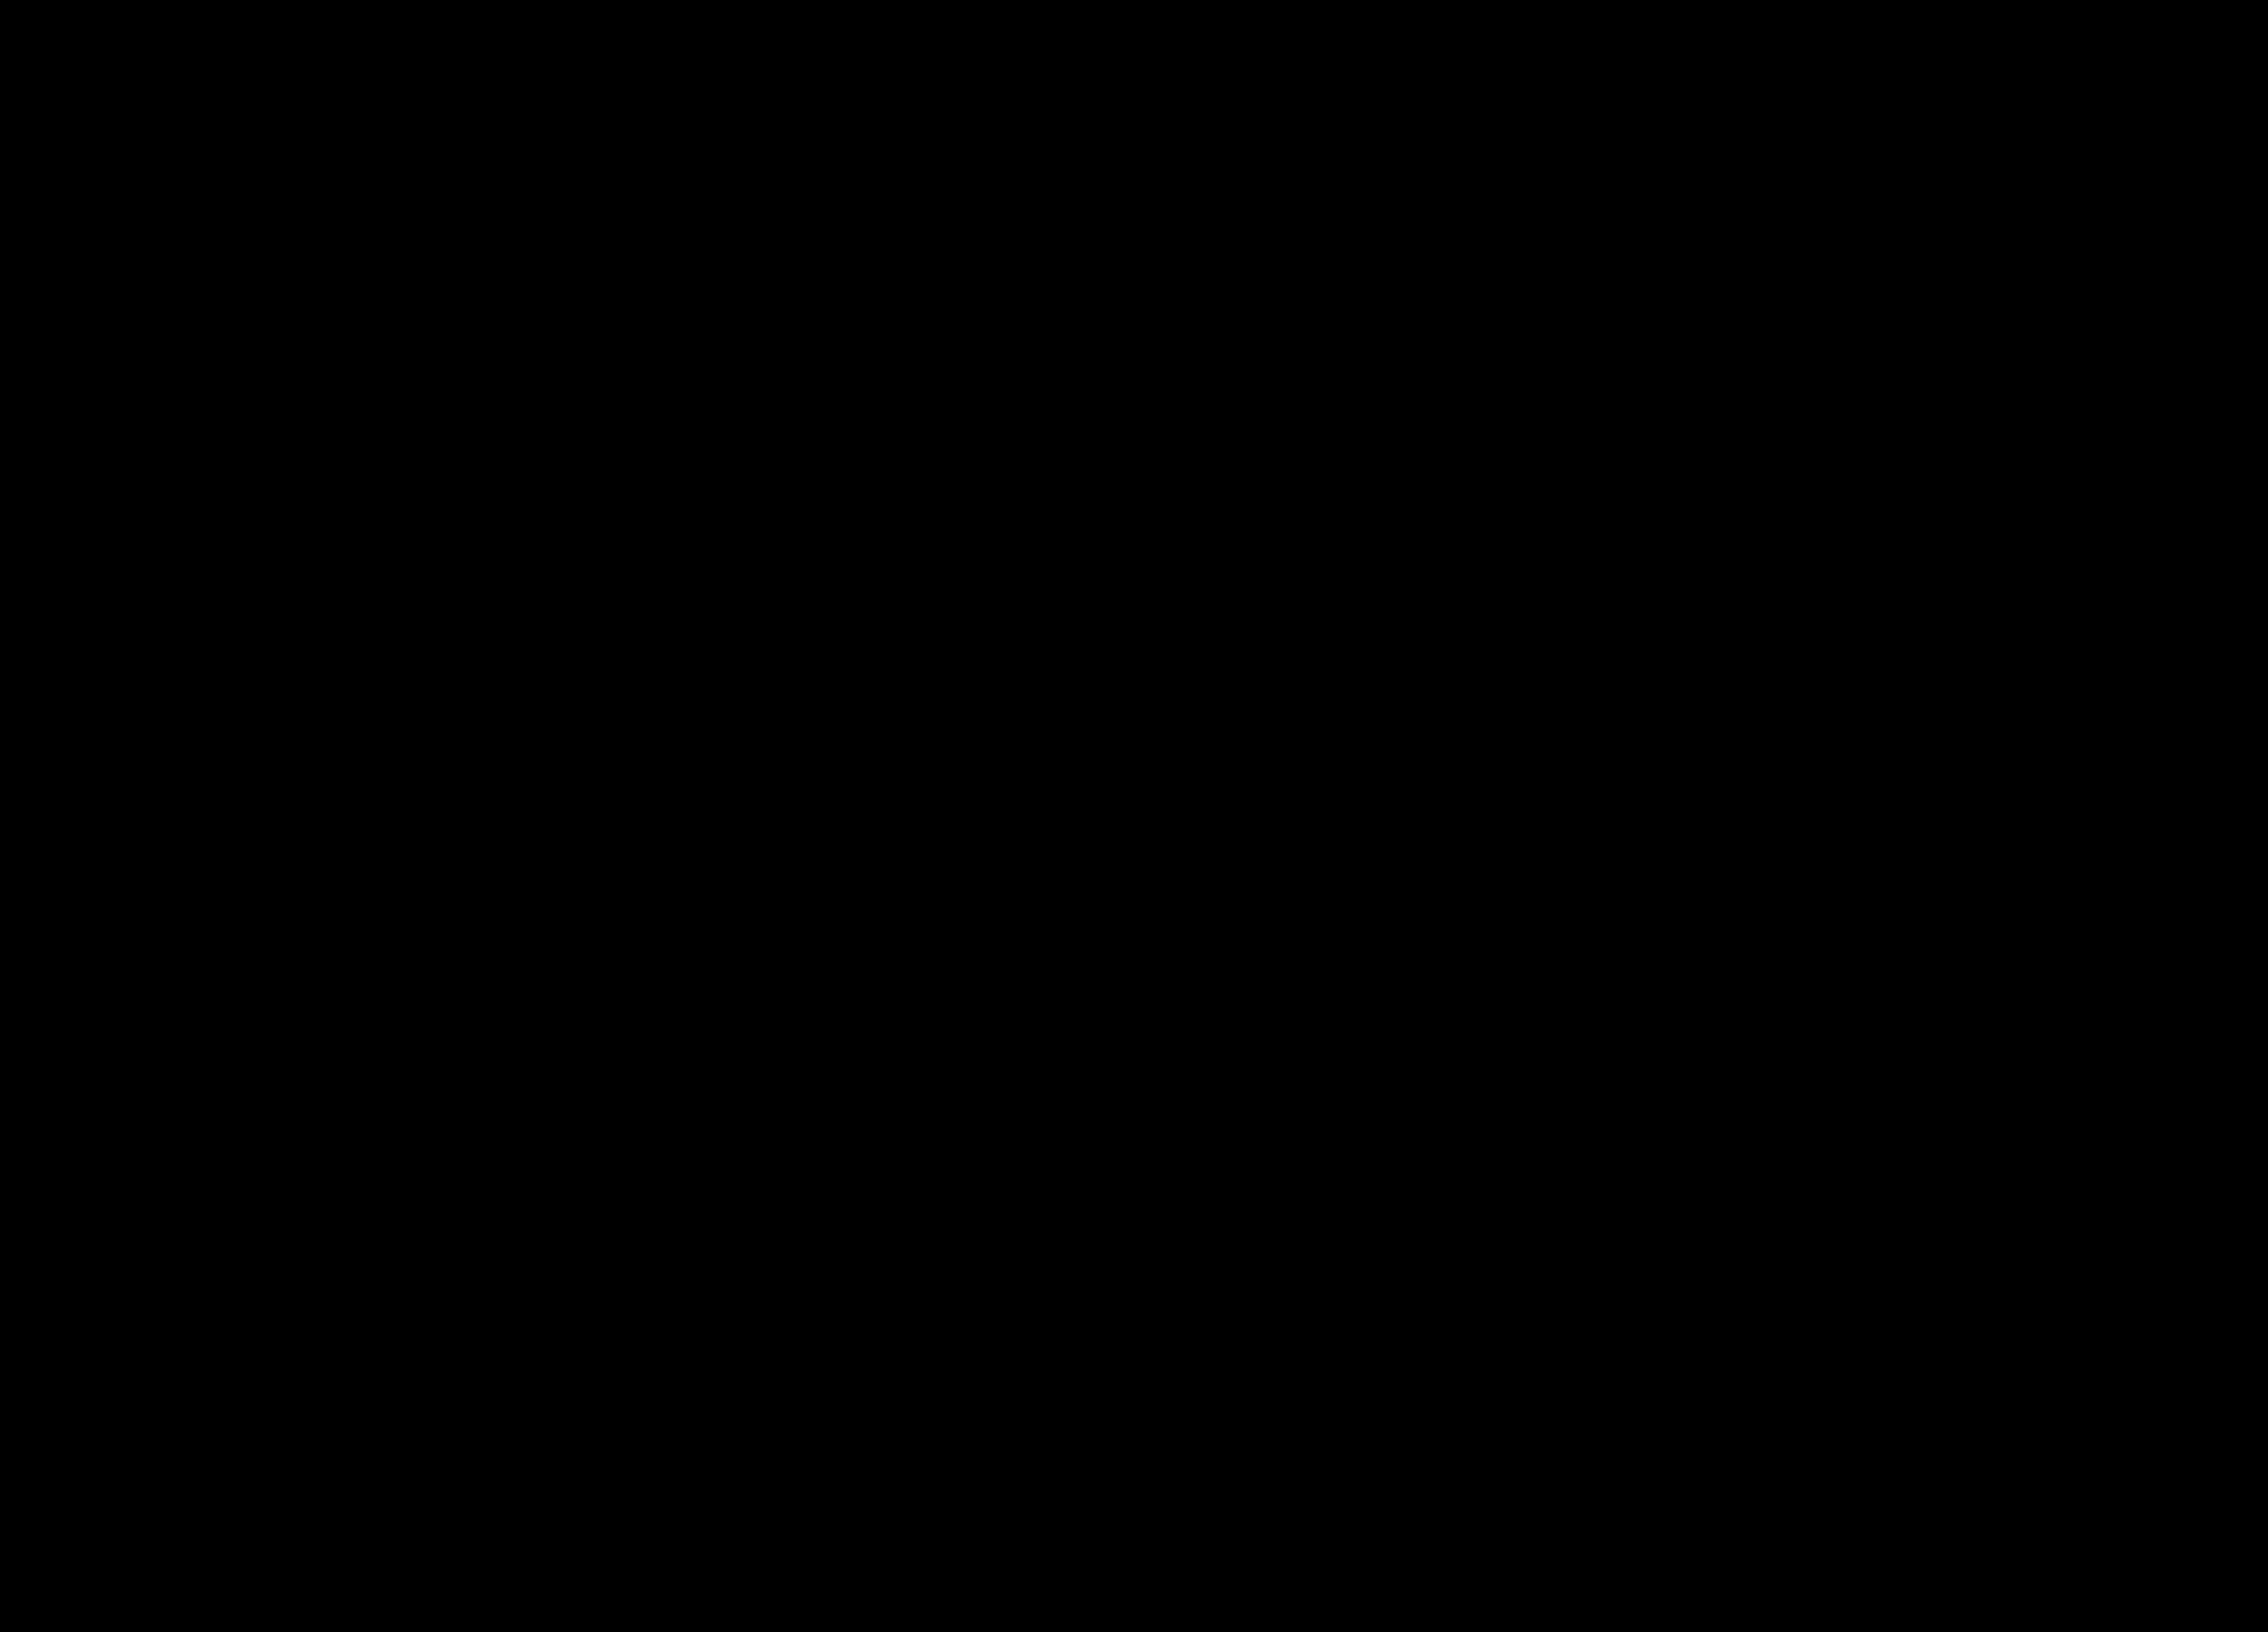 8 Grunge Frame (PNG) Vol  2 | OnlyGFX com